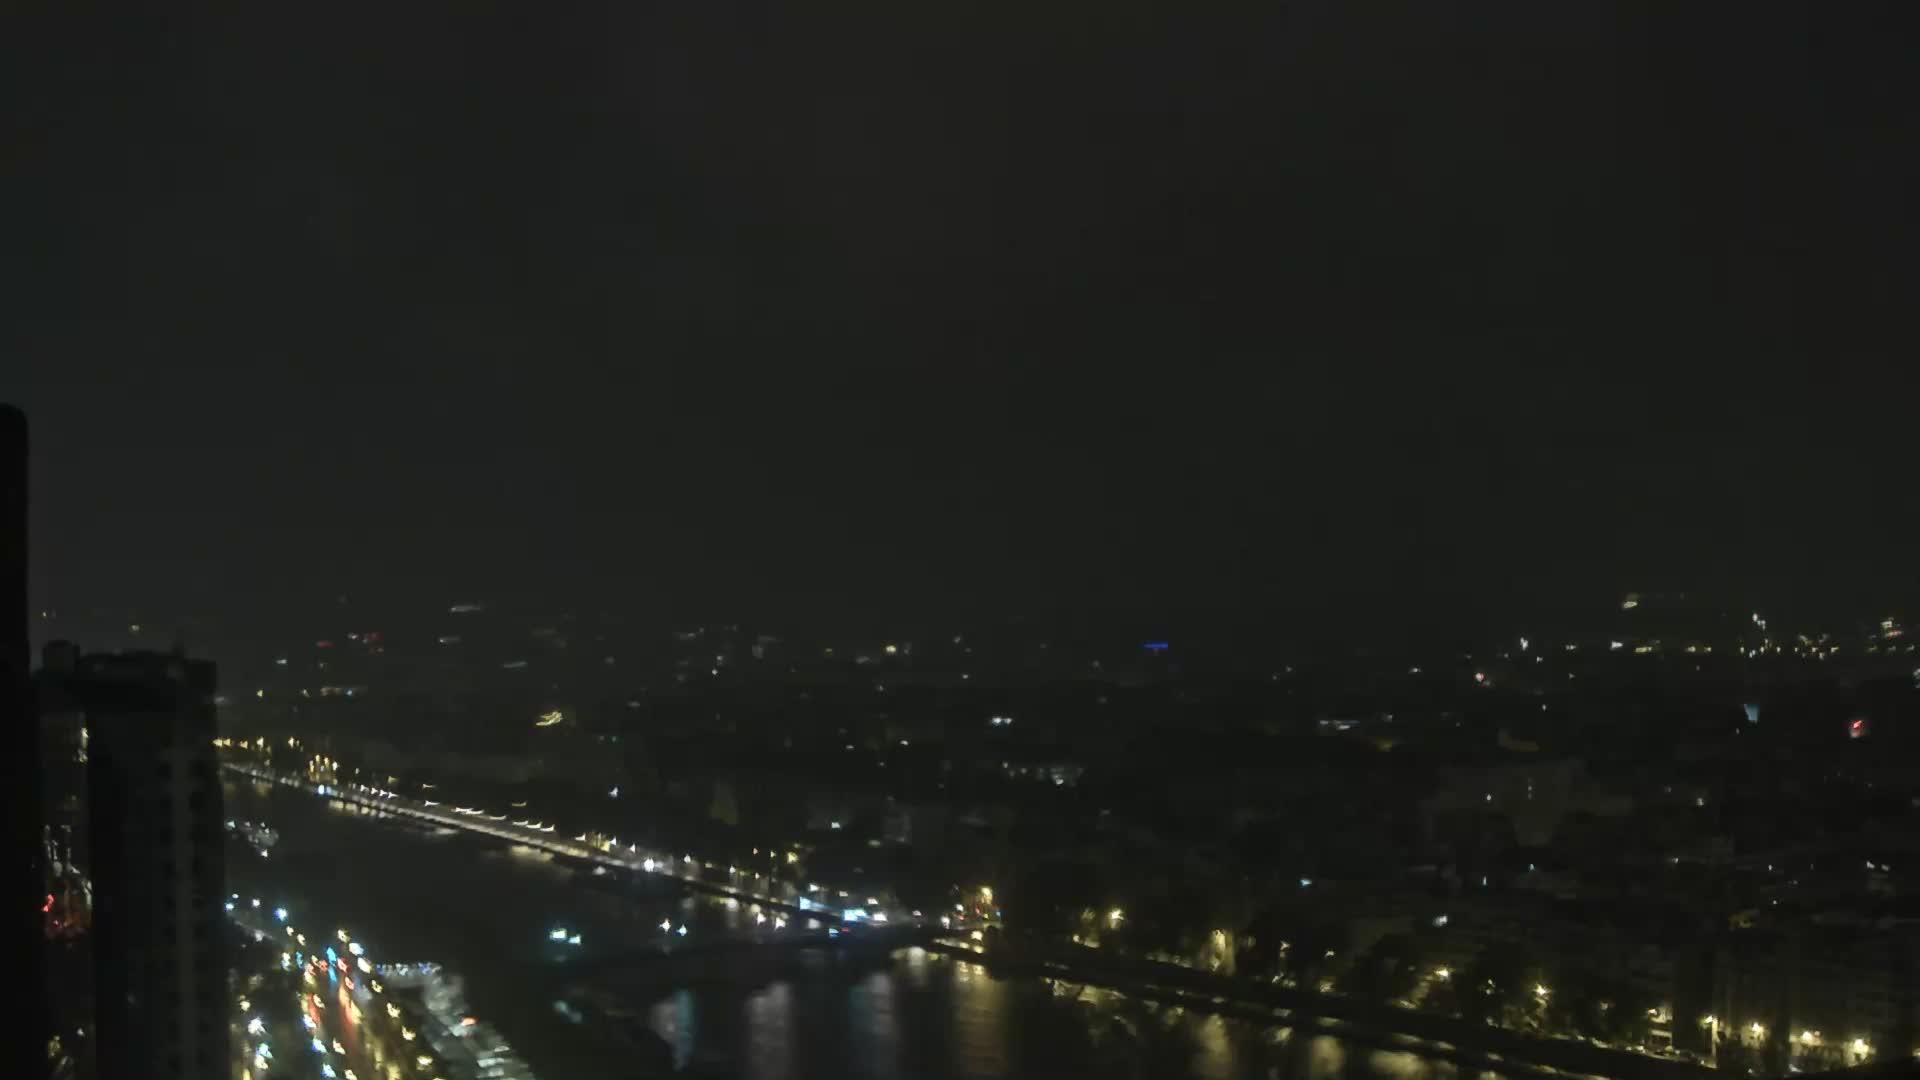 Parigi Gio. 04:24